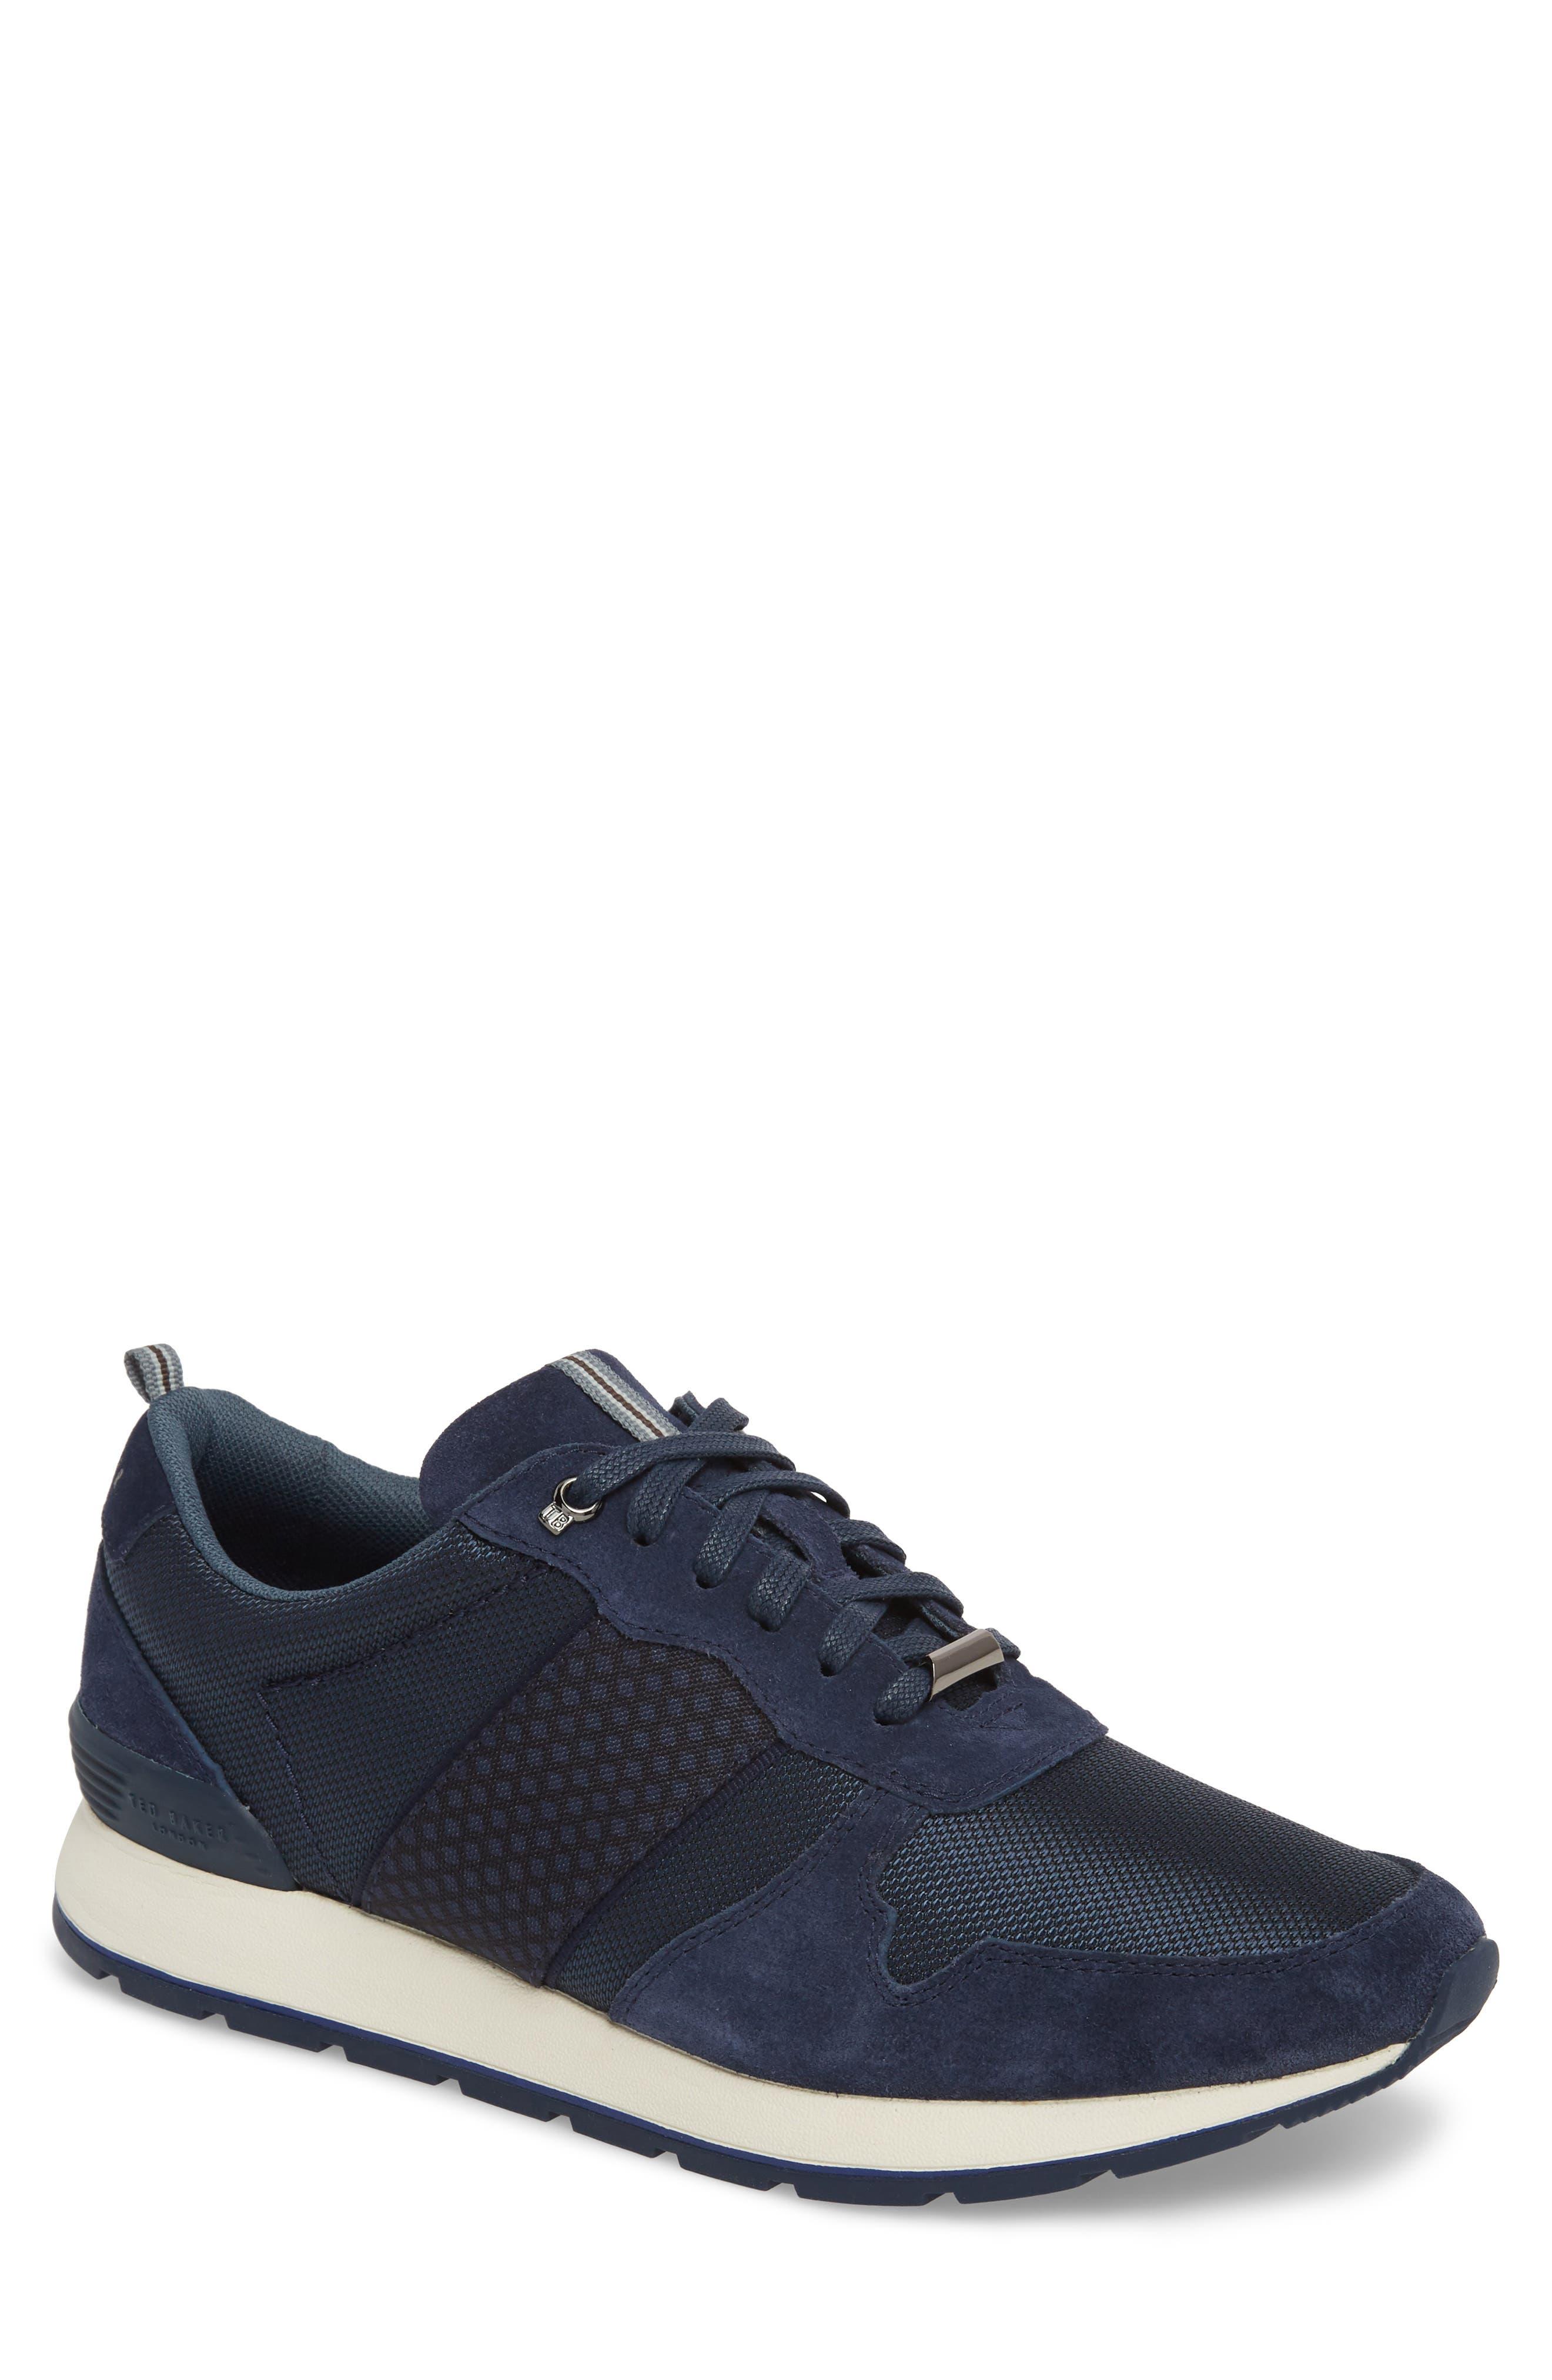 Hebey Lace-Up Sneaker,                             Main thumbnail 1, color,                             DARK BLUE TEXTILE